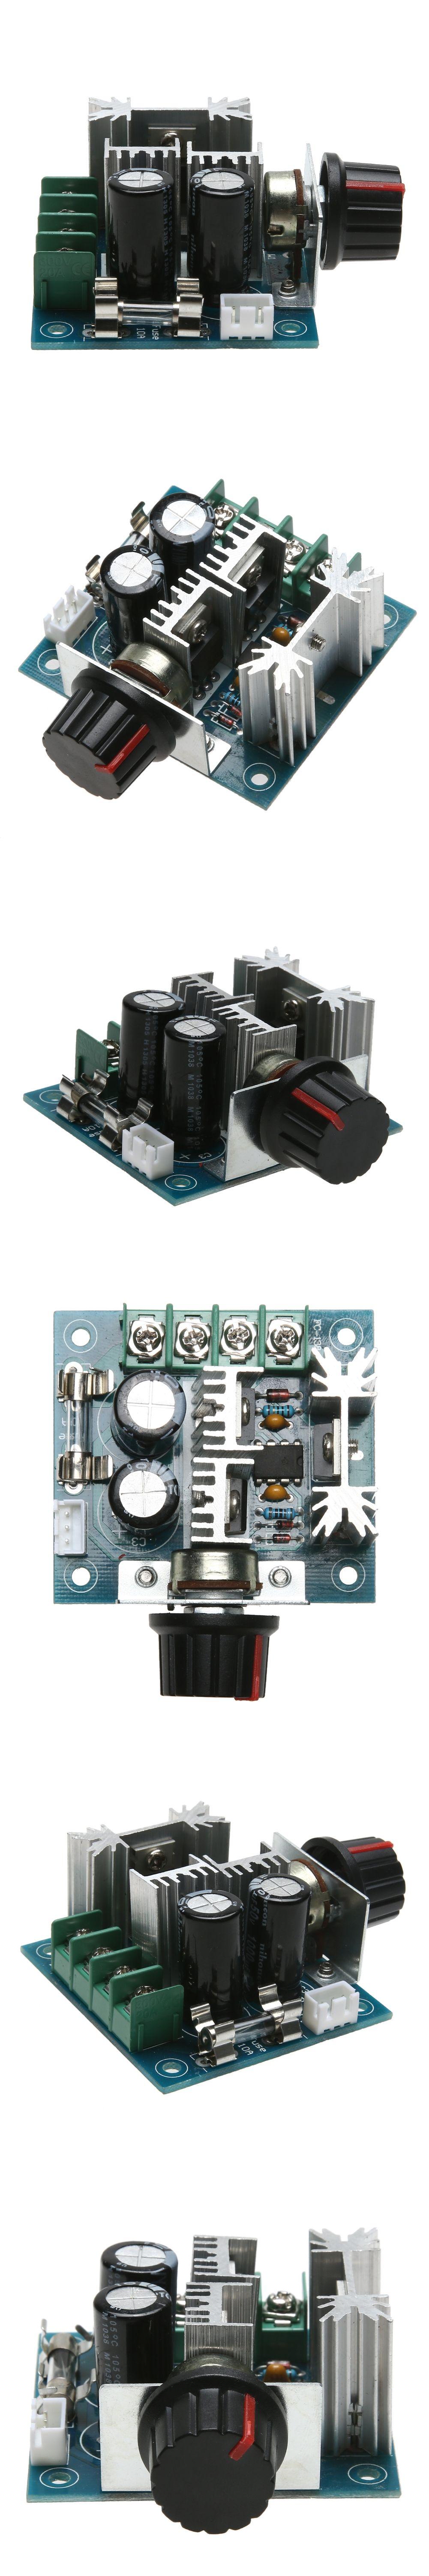 DC12V-40V DC Motor Speed Governor 13KHZ PWM Controller 10A B100K ...